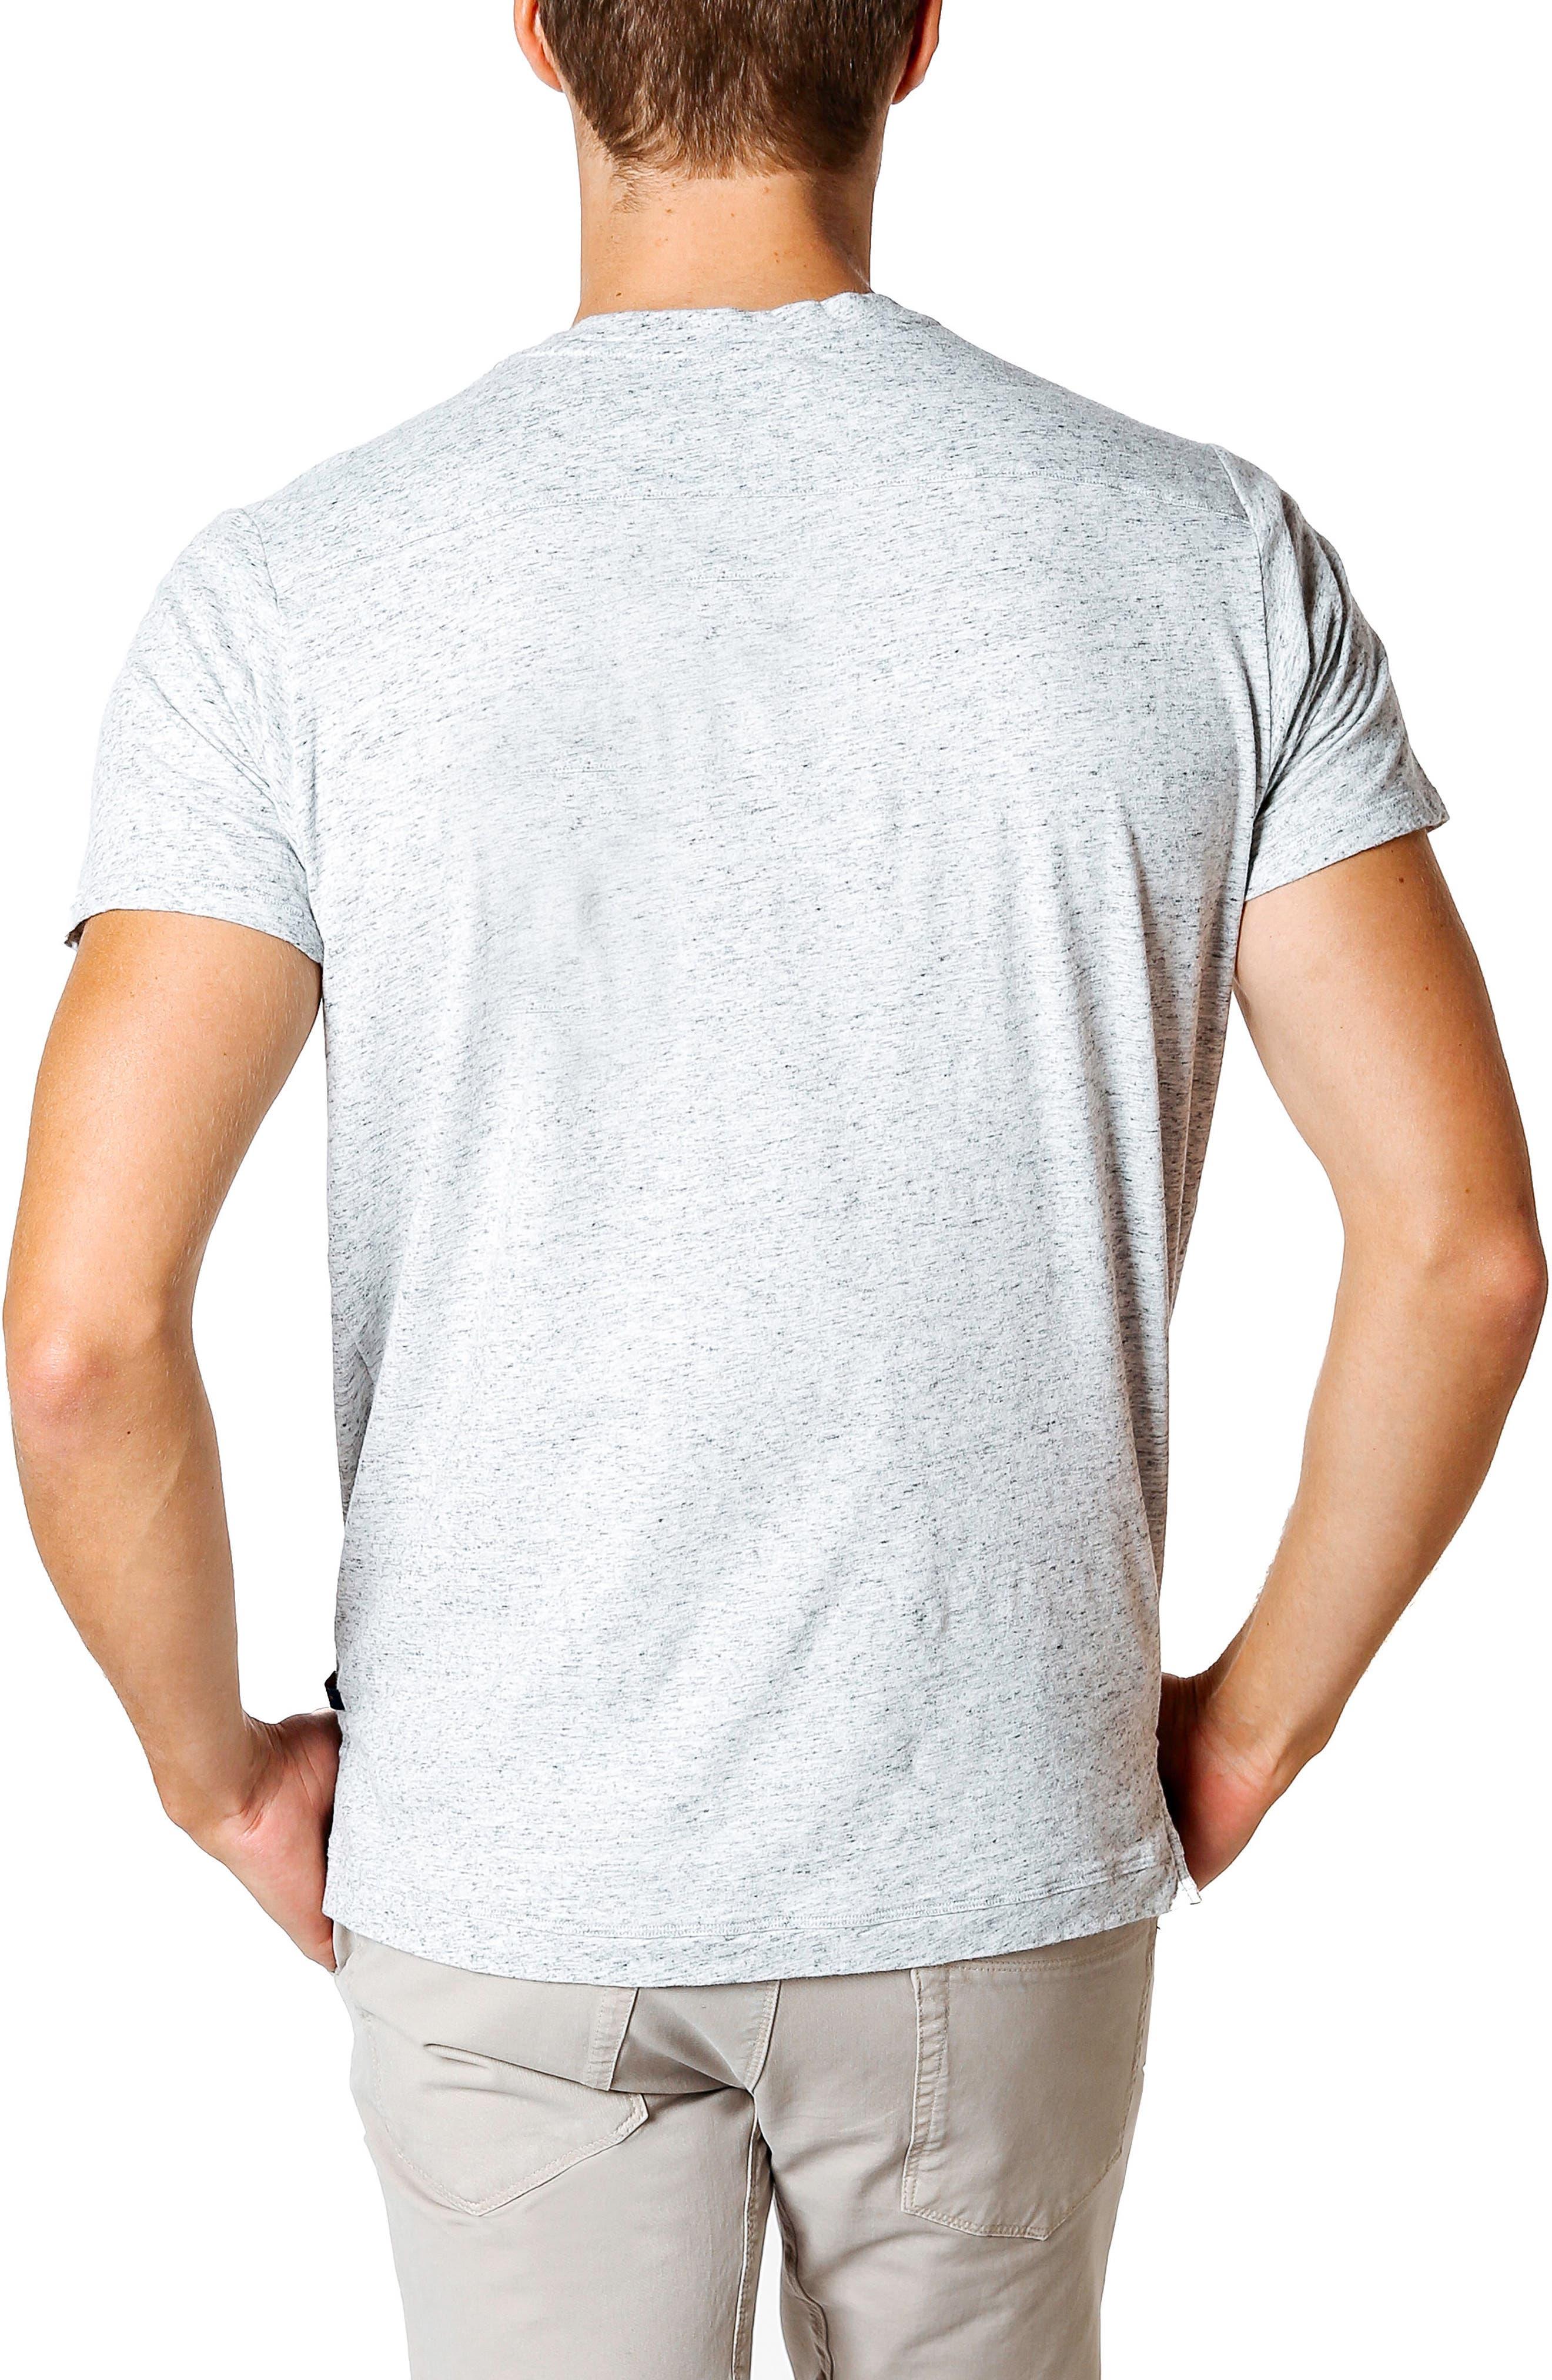 Slim Fit T-Shirt,                             Alternate thumbnail 2, color,                             GREY HEATHER